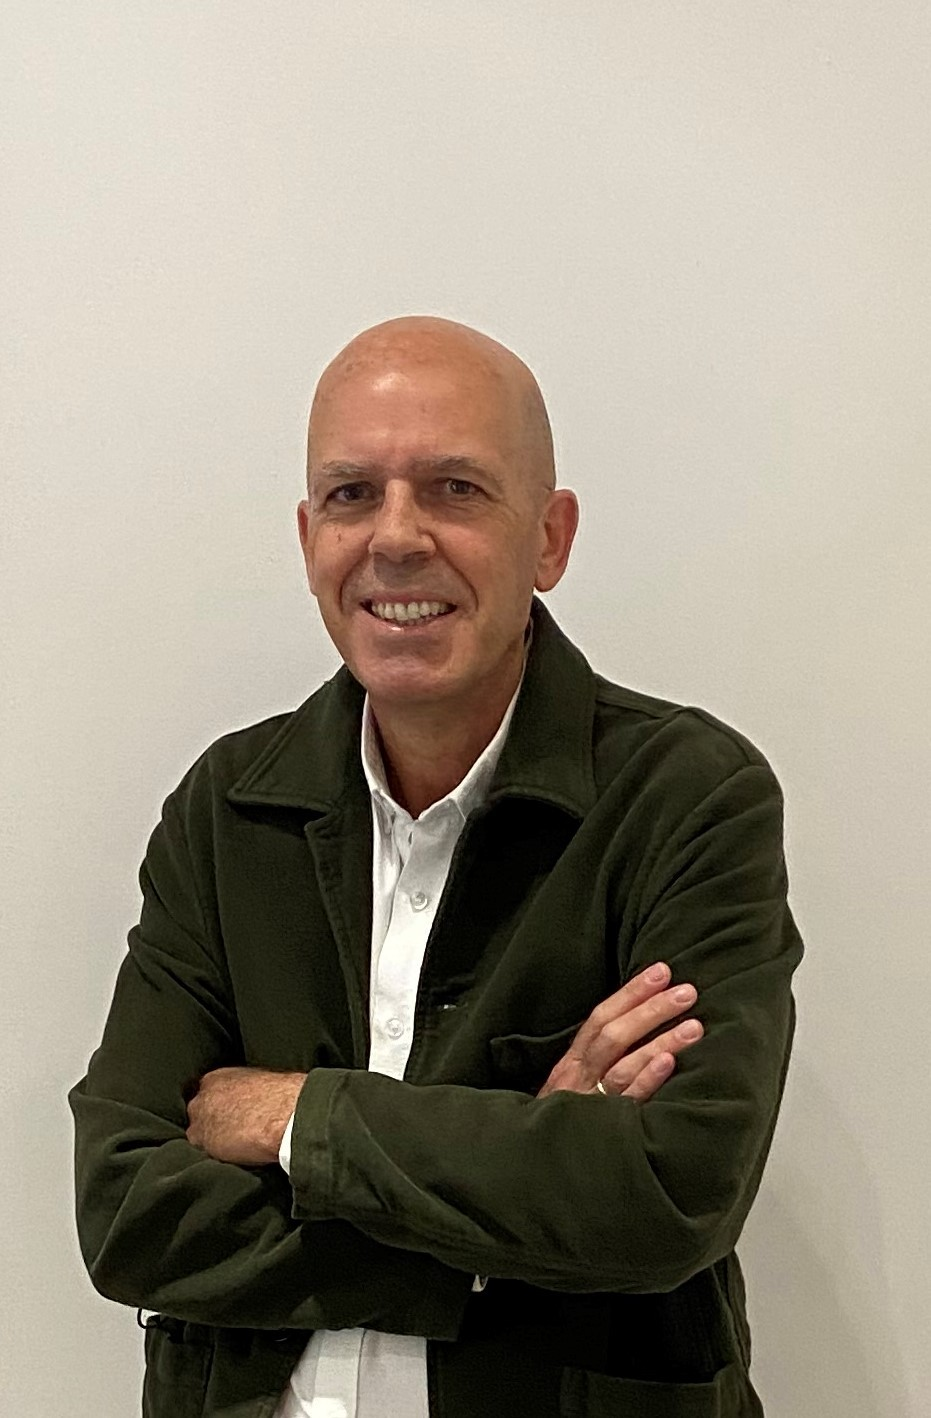 José Ignacio Bardisa Jorda